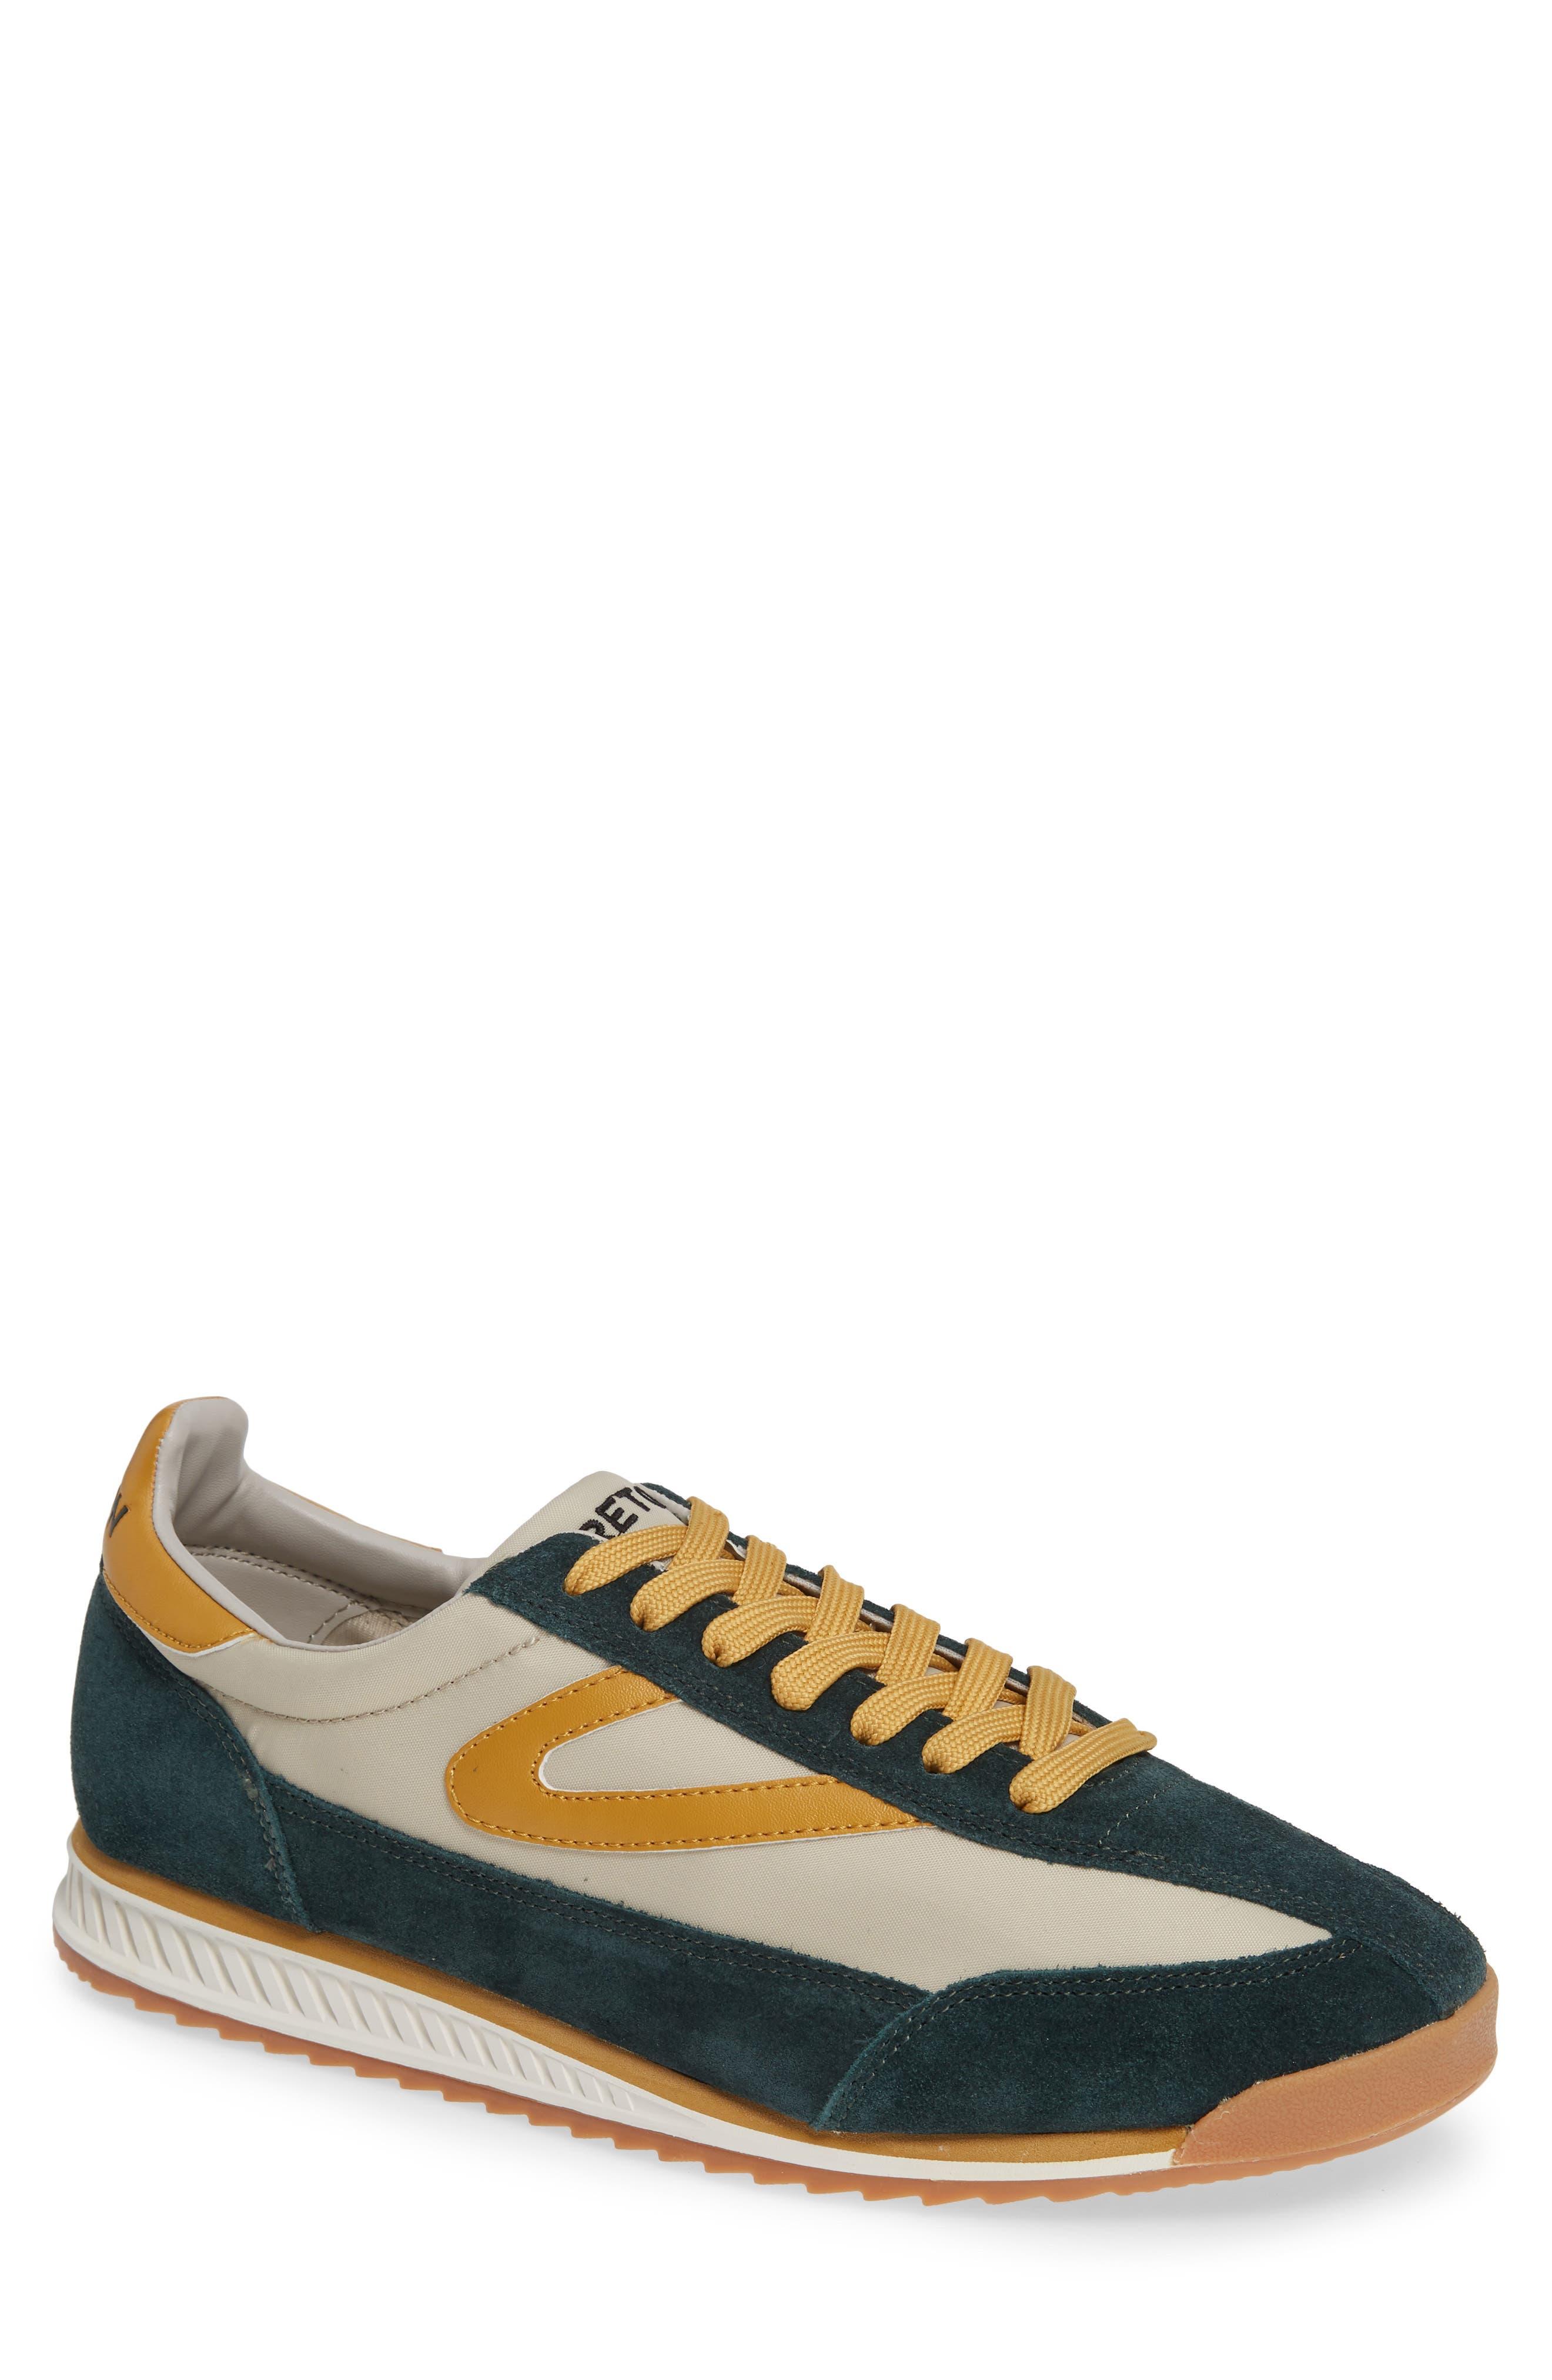 Rawlins2 Sneaker,                         Main,                         color, 300